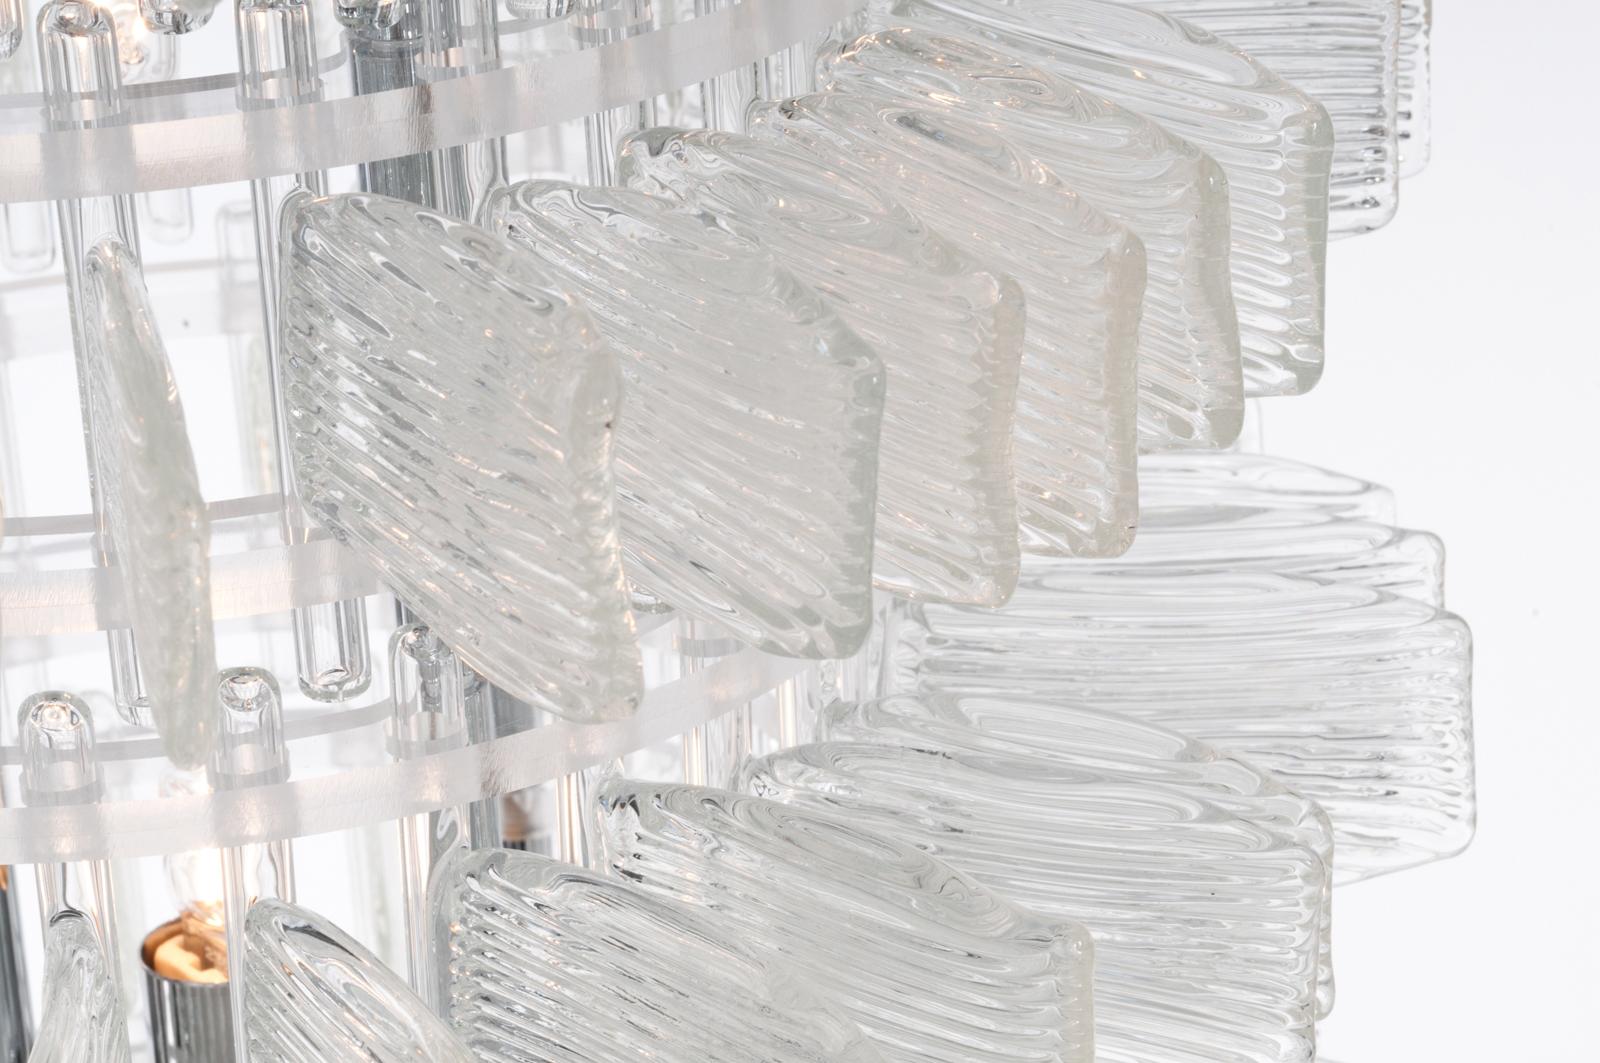 anemone-32-table-chrome-cristal-crystal-veronese-maurizio-galante-tal-lancman-61.jpg